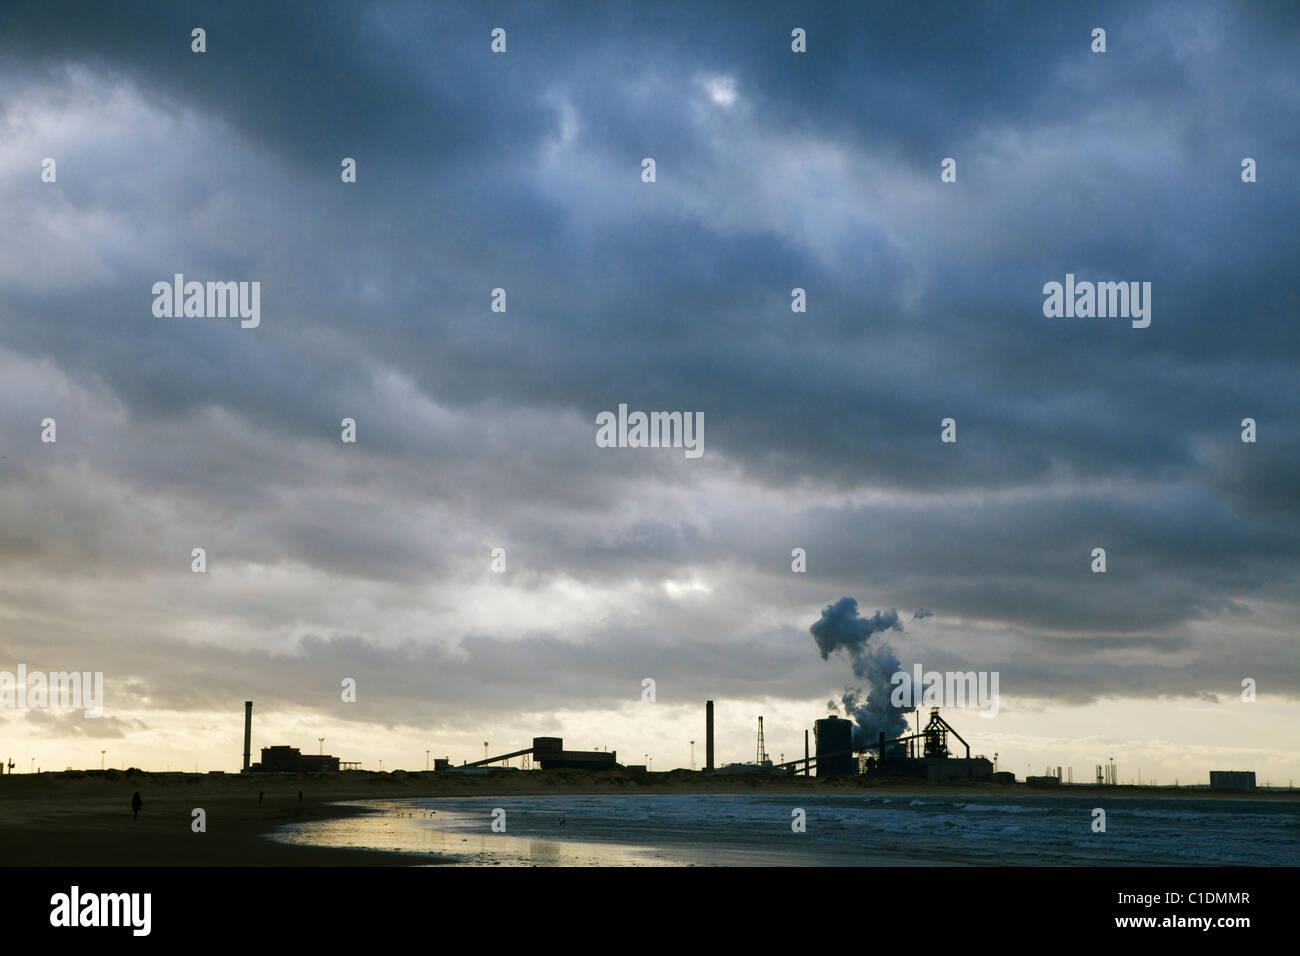 Redcar steelworks outline against dark forbidding sky - Stock Image